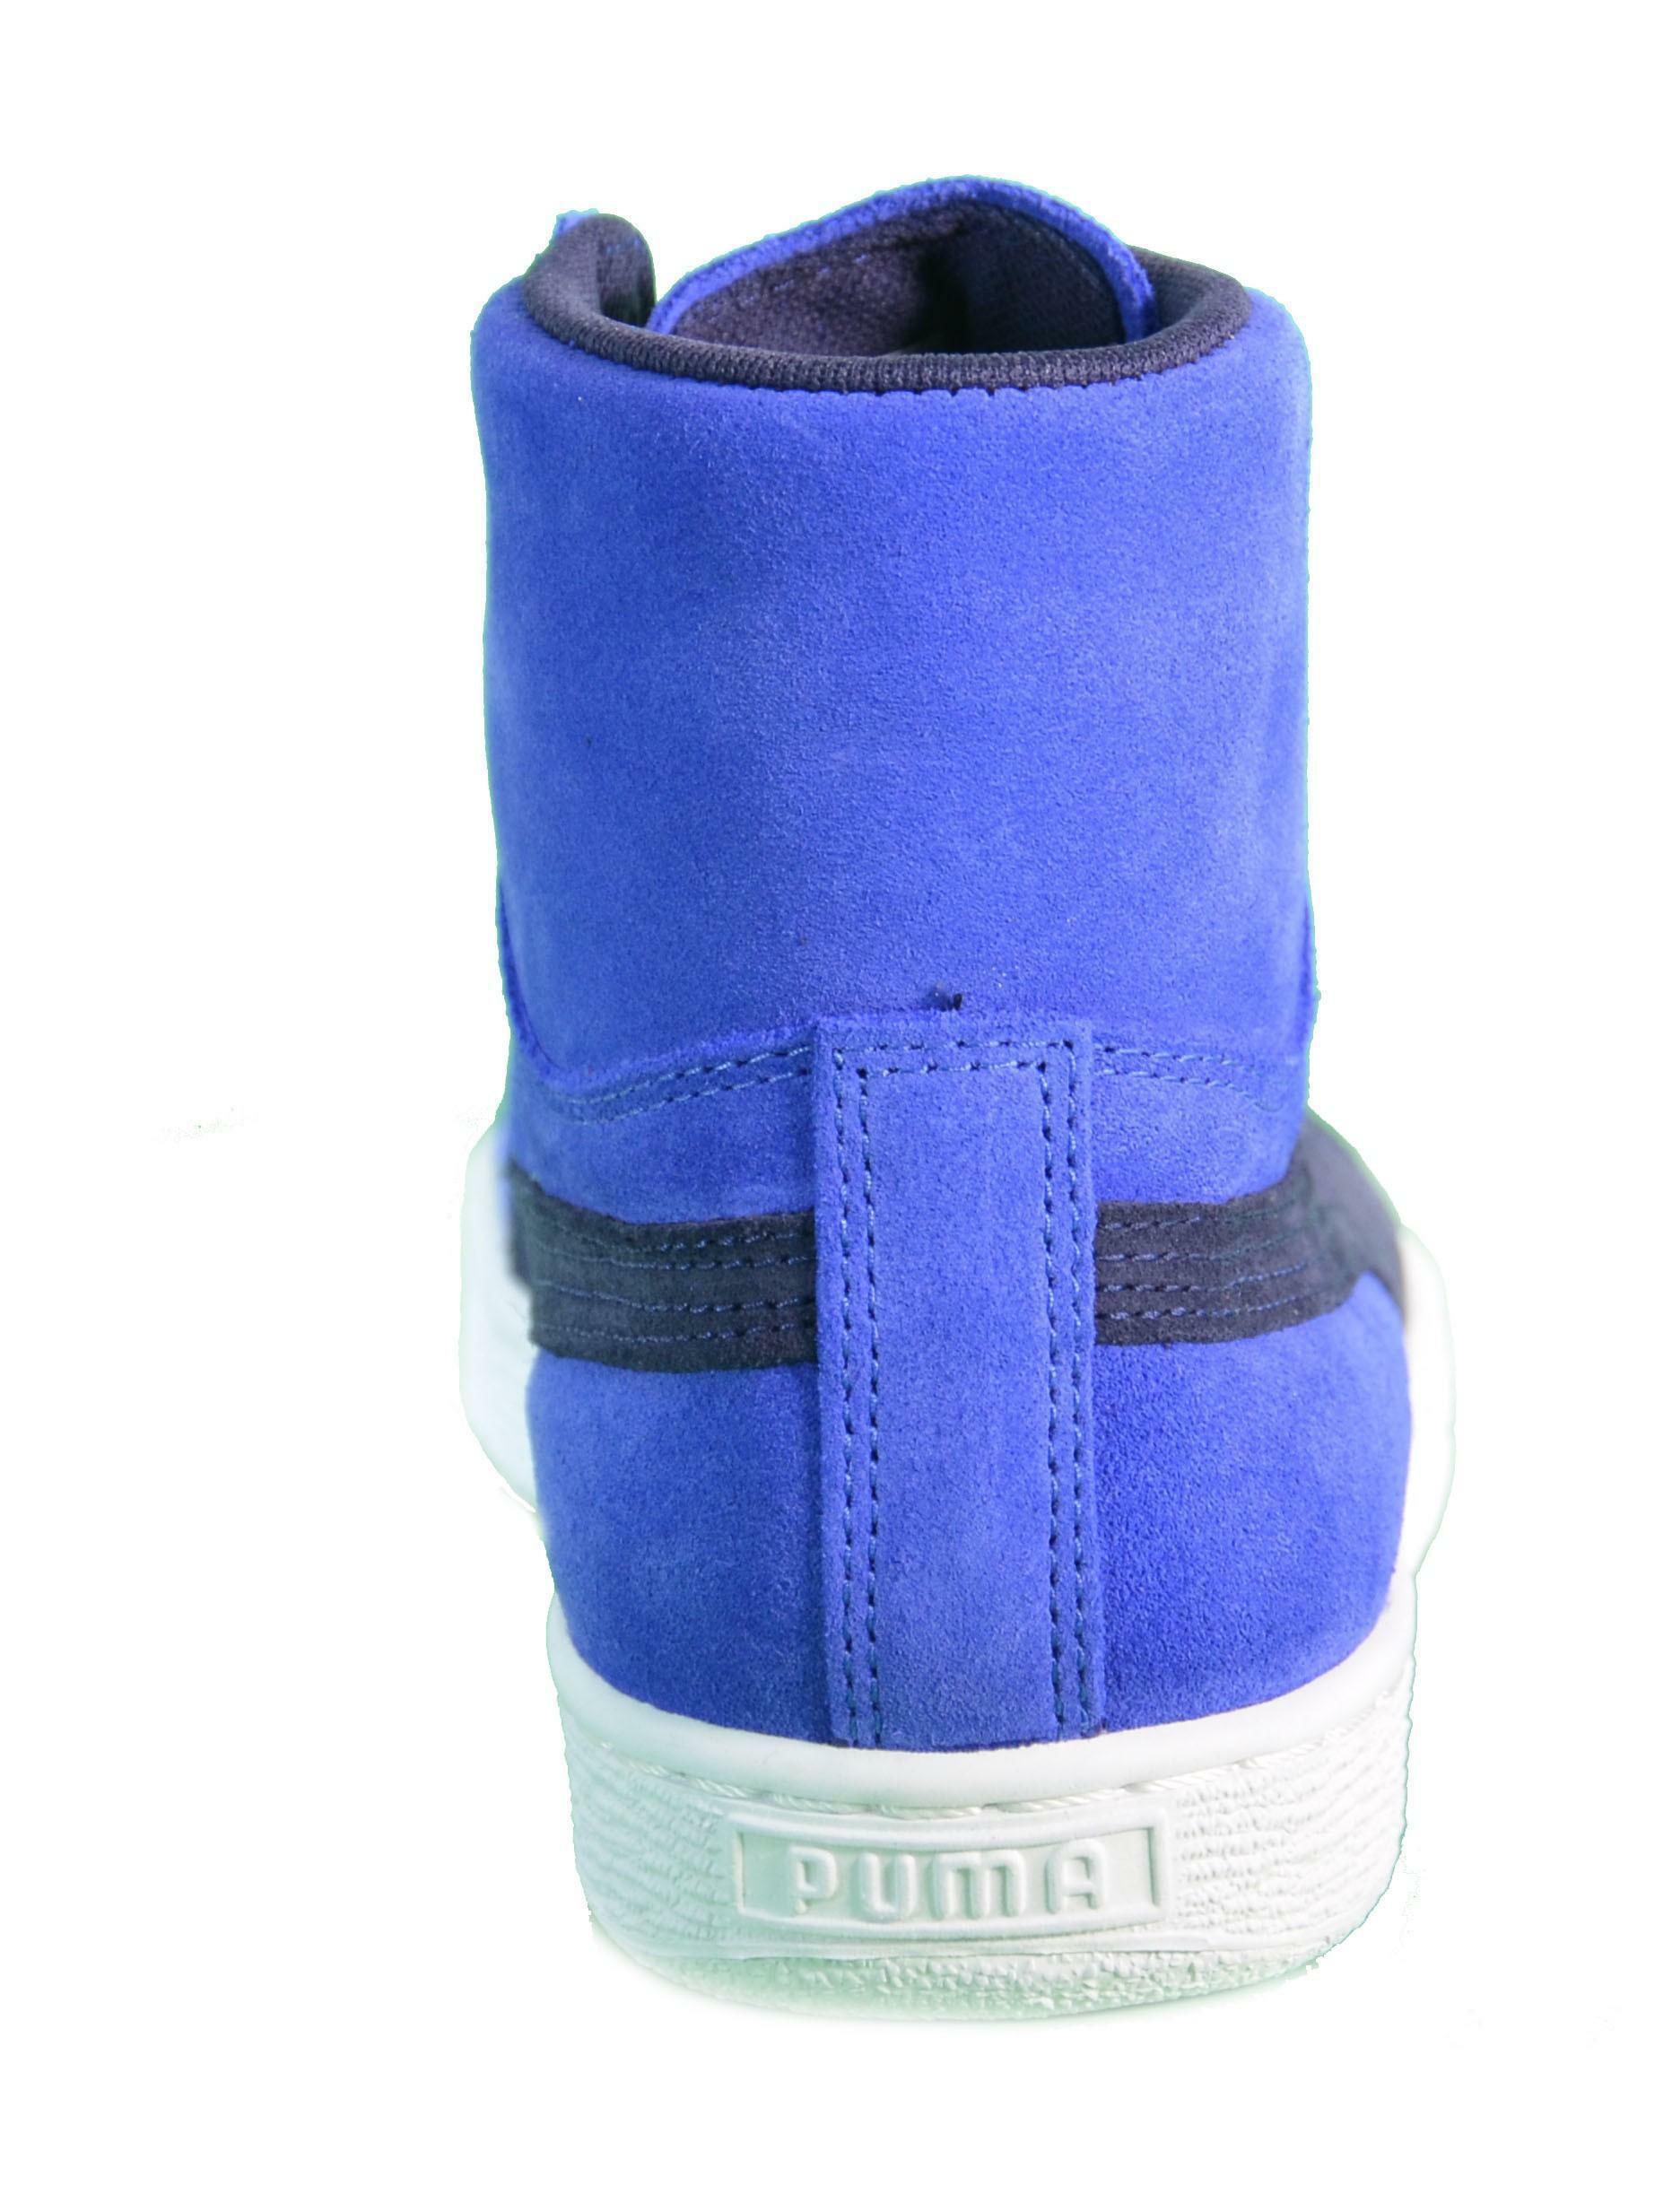 puma puma suede mid wmn's scarpe donna blu pelle 355460